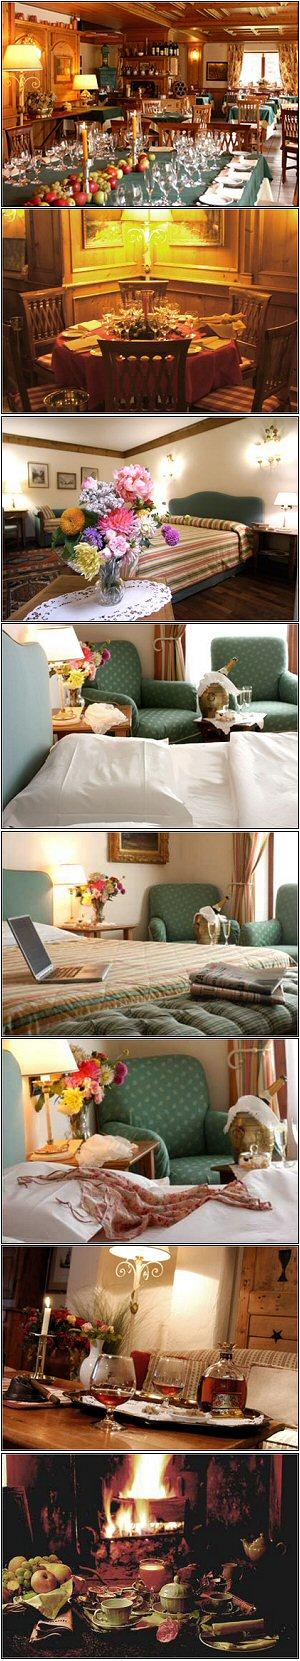 Hotel auberge de la maison prenotazione albergo courmayeur for Auberge de la maison entreves